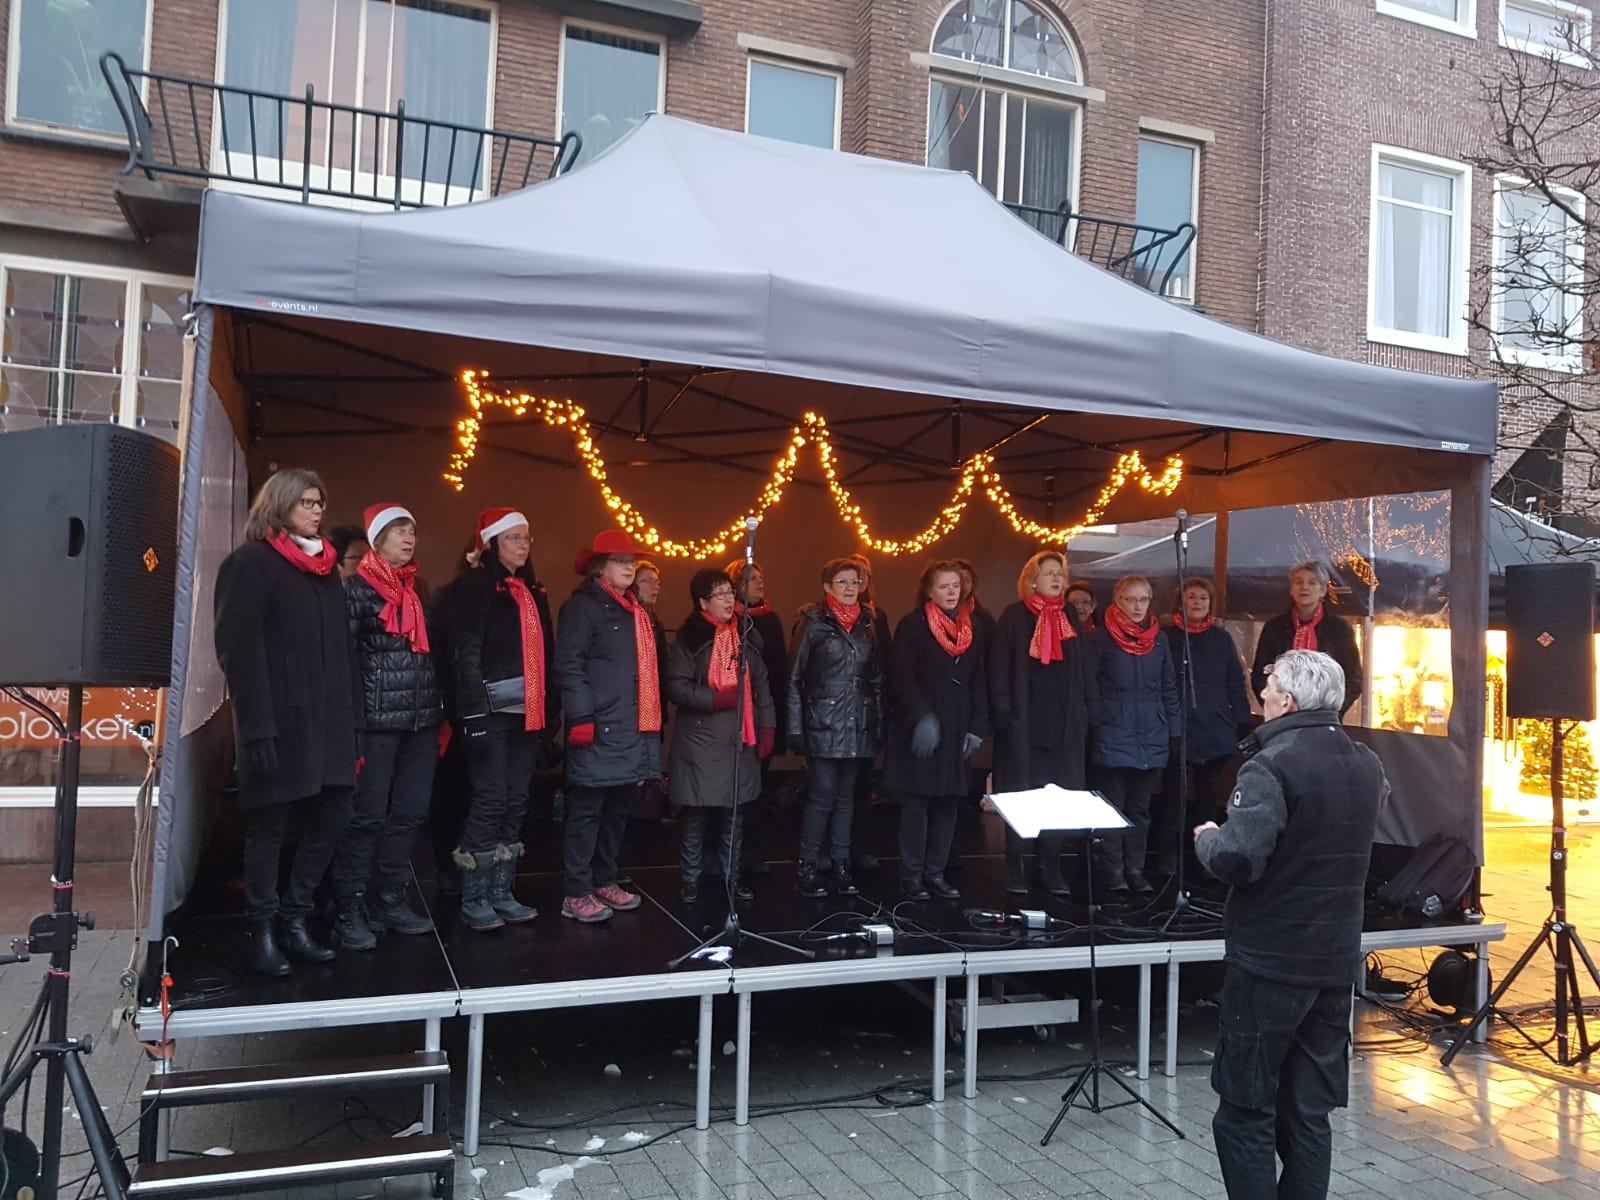 Kerstmarkt, Culemborg, 16 december 2018